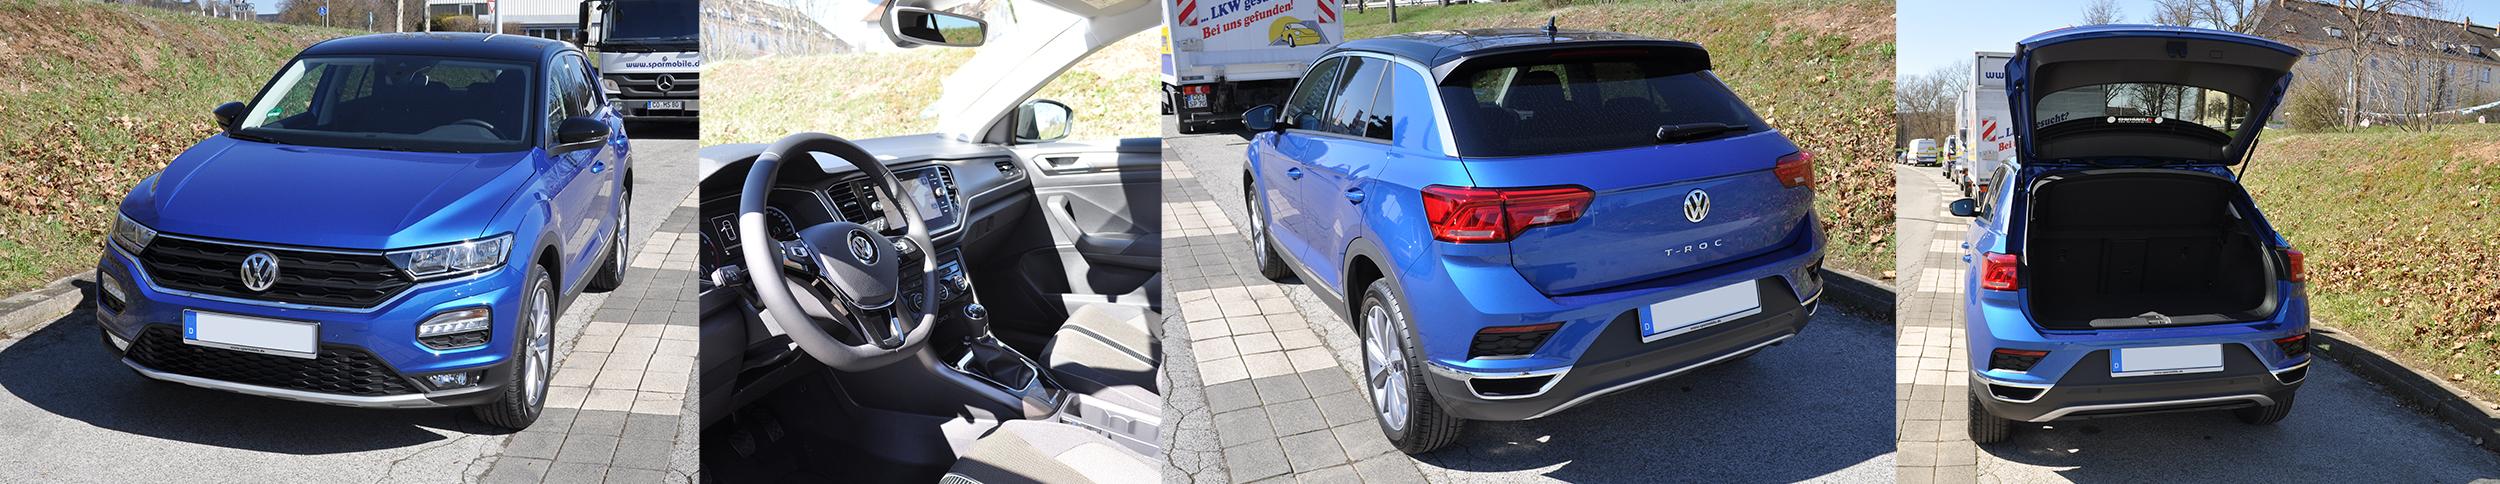 VW T-Roc 2019 Ausstattung